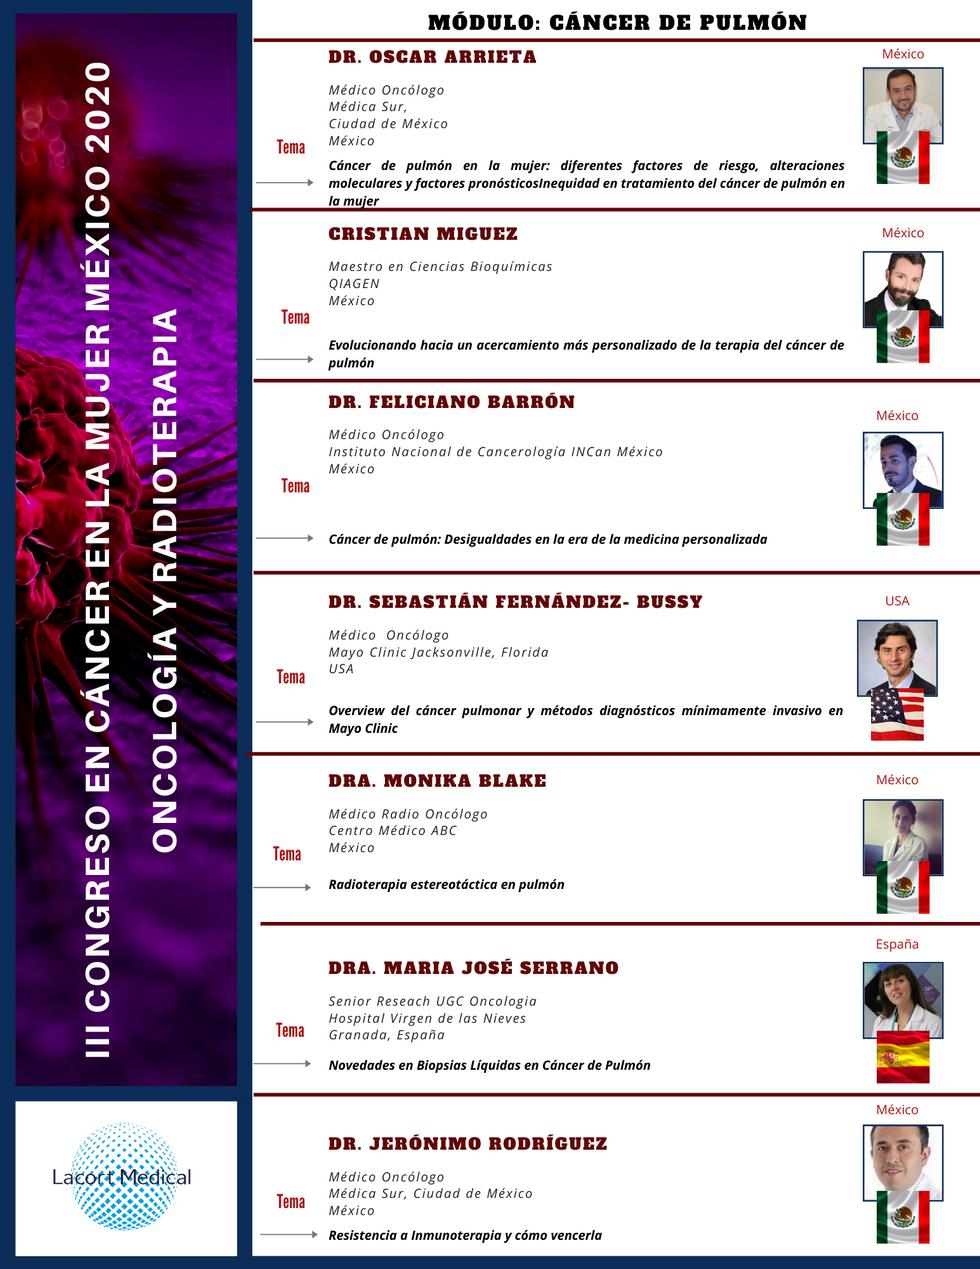 Mexico agenda 2020 (18).png